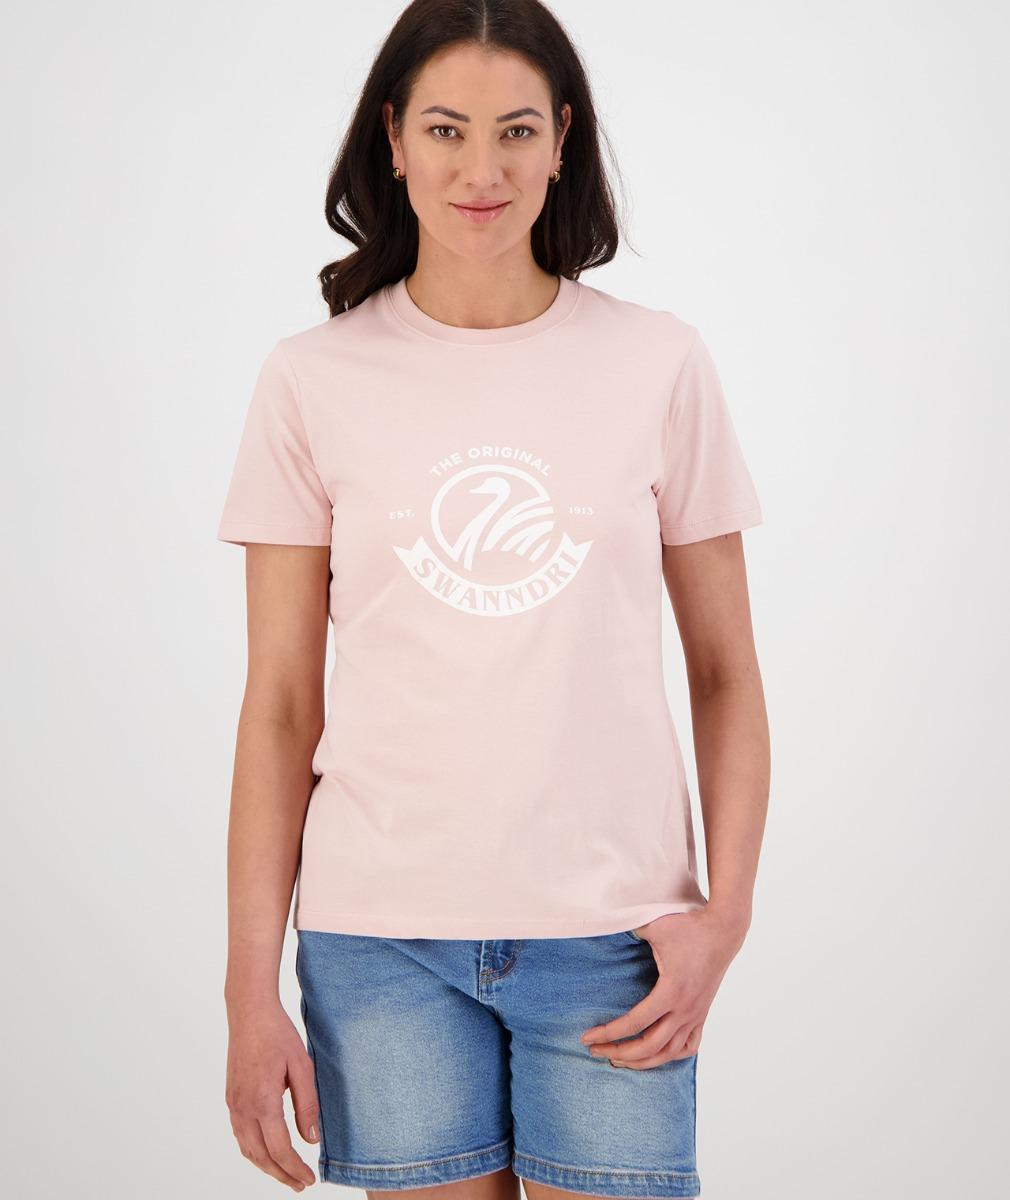 Swanndri Women's Heritage Logo Tee in Pink/White